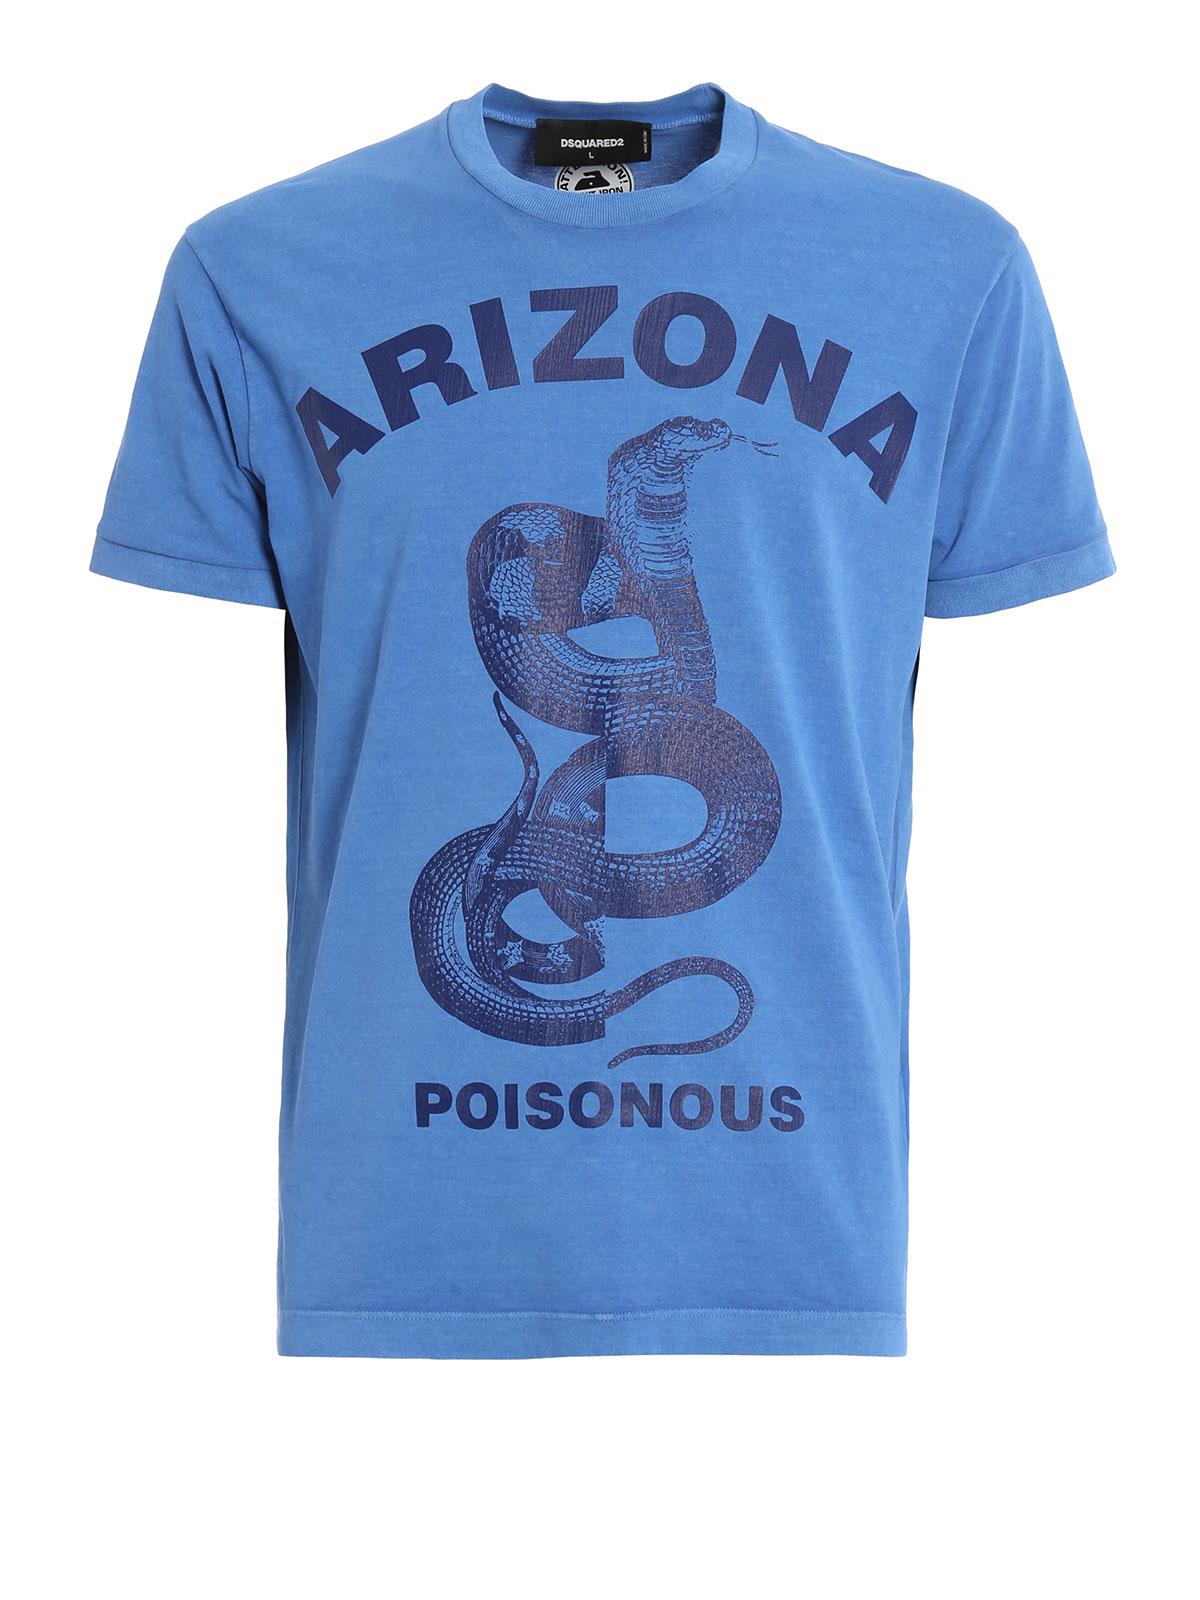 Arizona print vintage t shirt by dsquared2 t shirts ikrix for Vintage t shirt printing